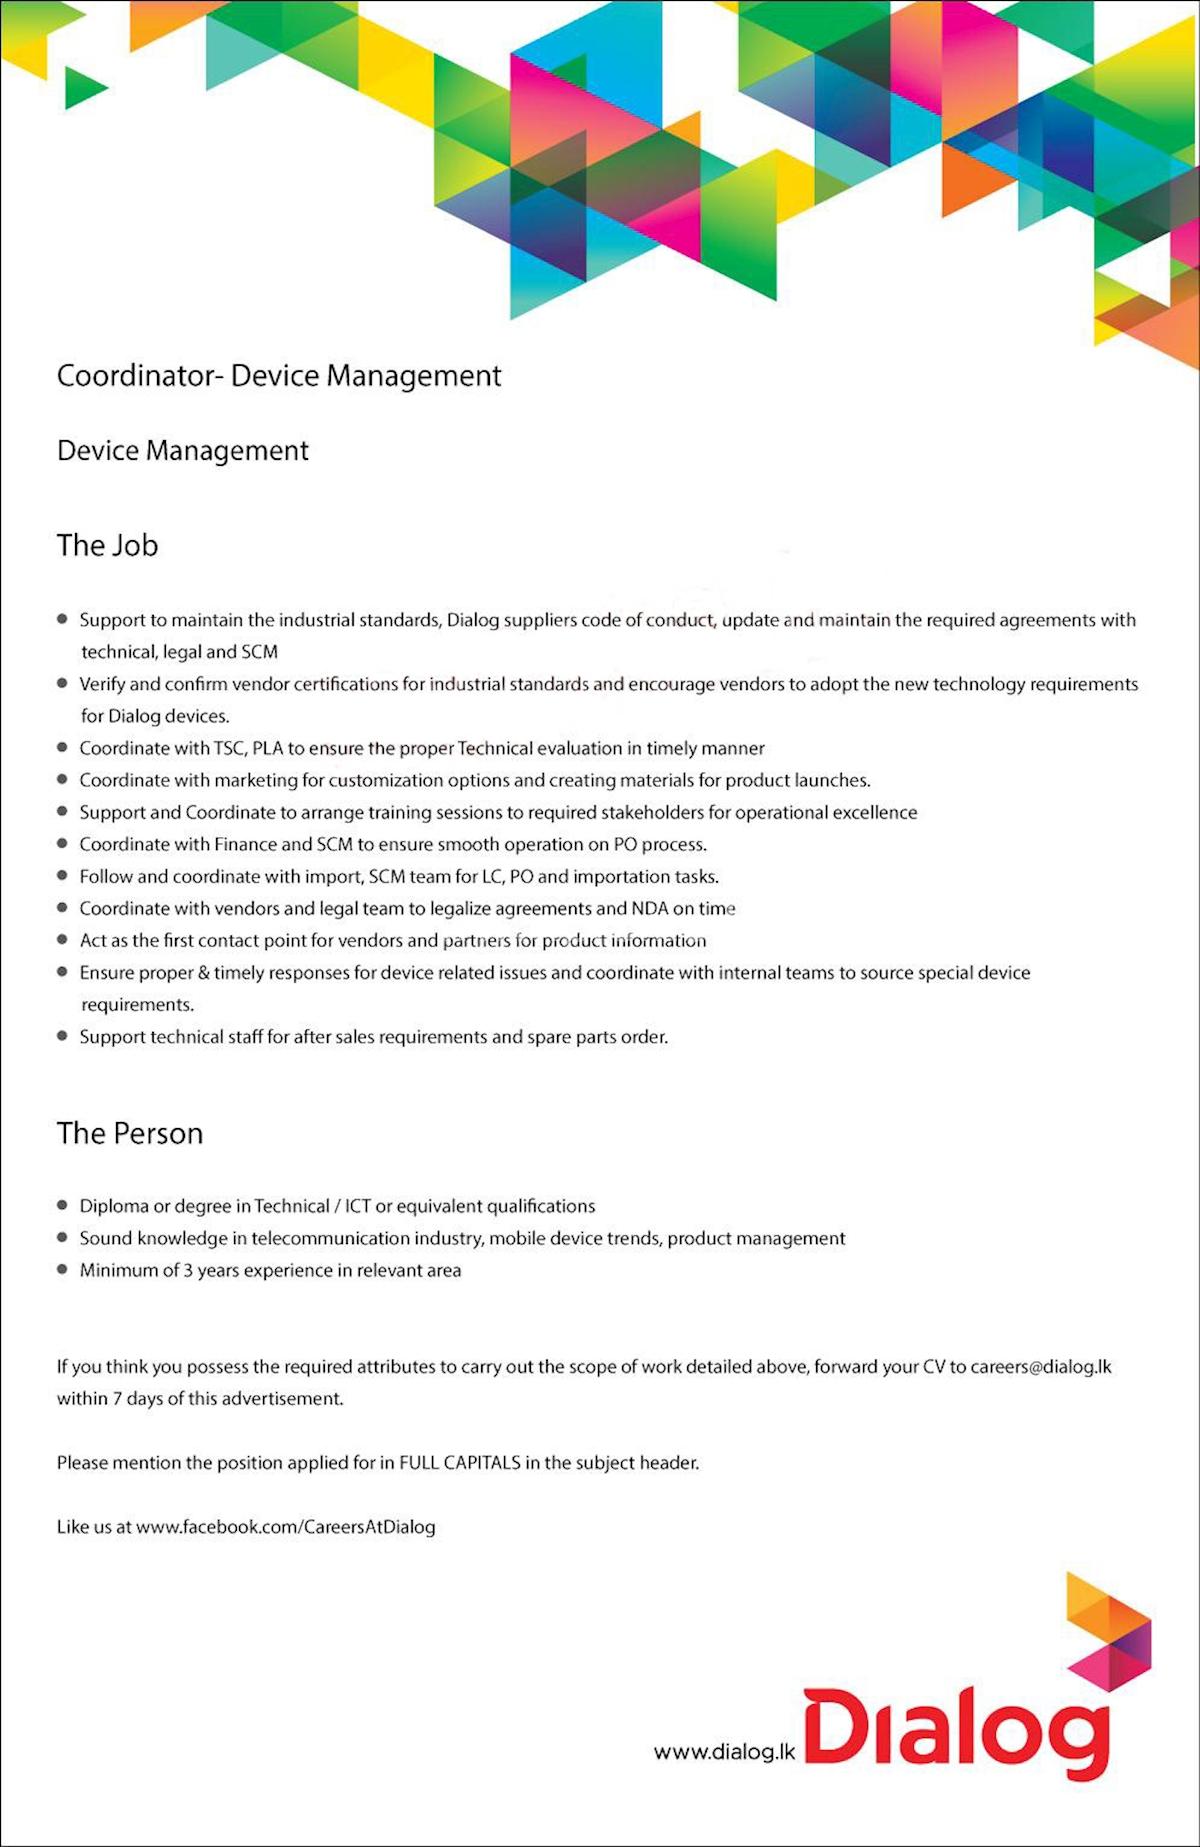 Coordinator - Device Management